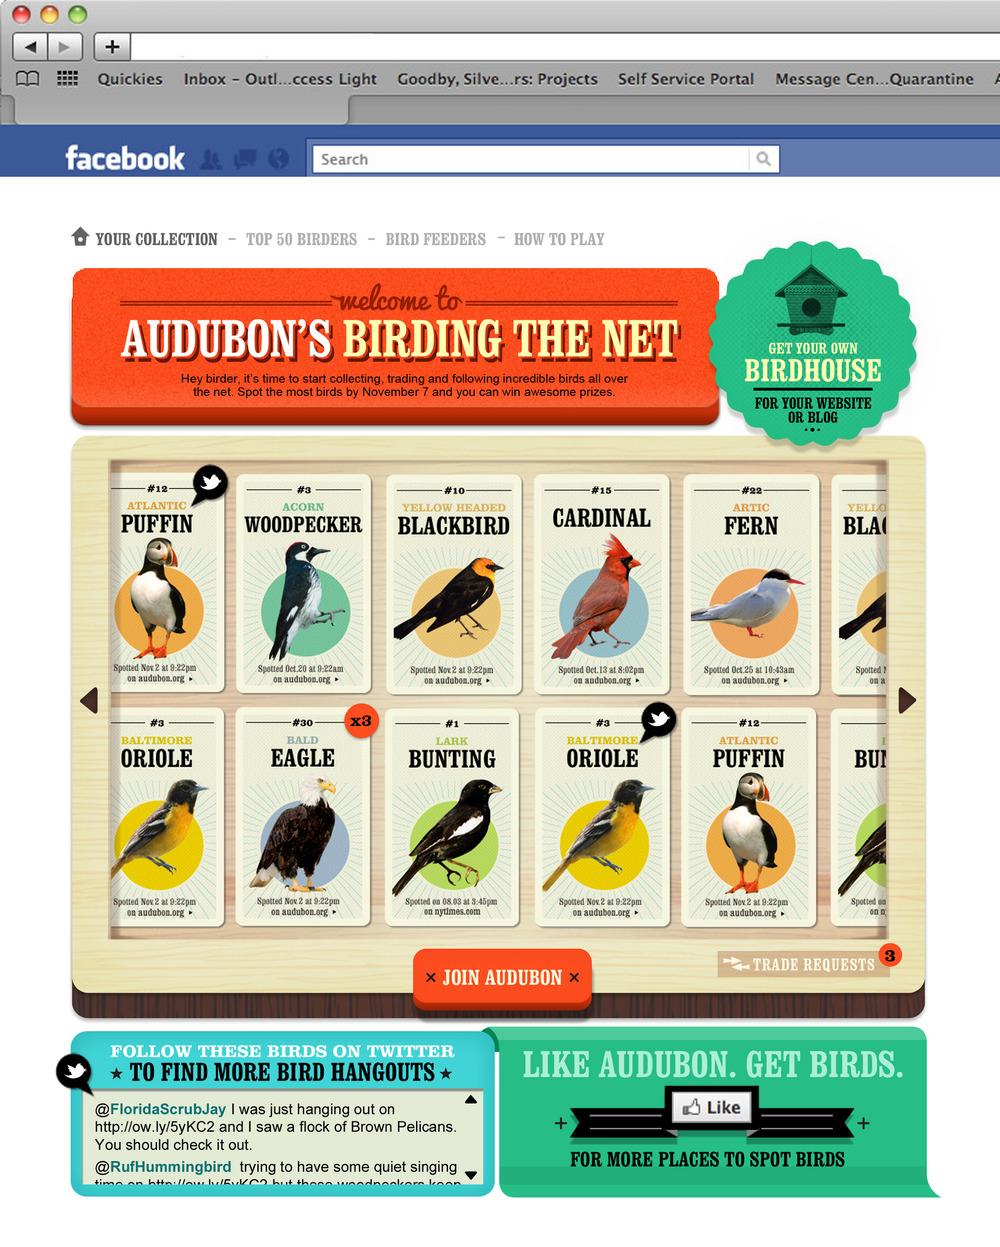 Birding the Net - on Facebook